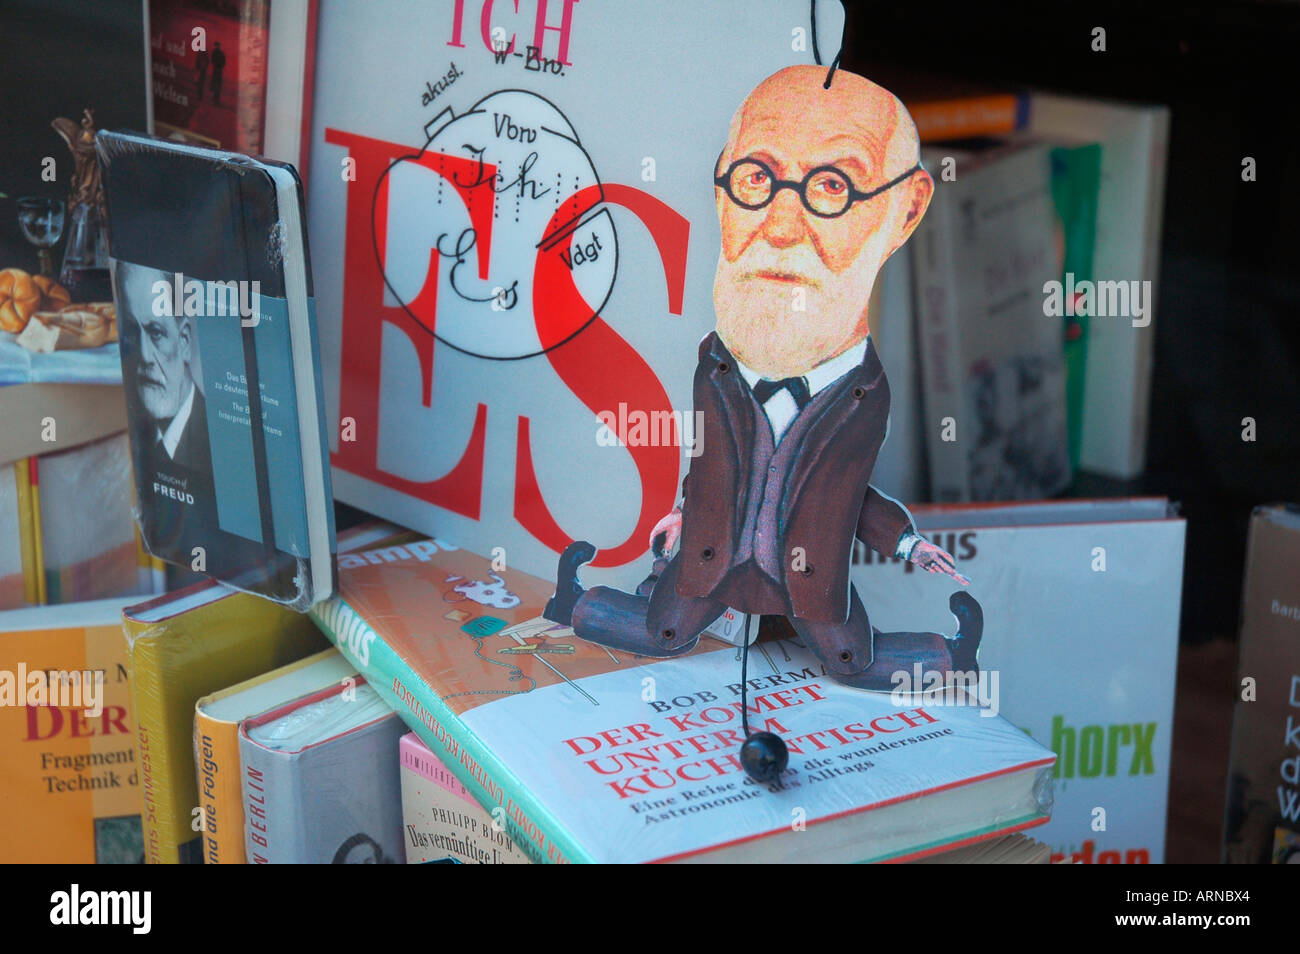 Jumping Jack Sigmund Freud in a shopwindow of a viennese bookshop, Vienna, Austria, Europe - Stock Image